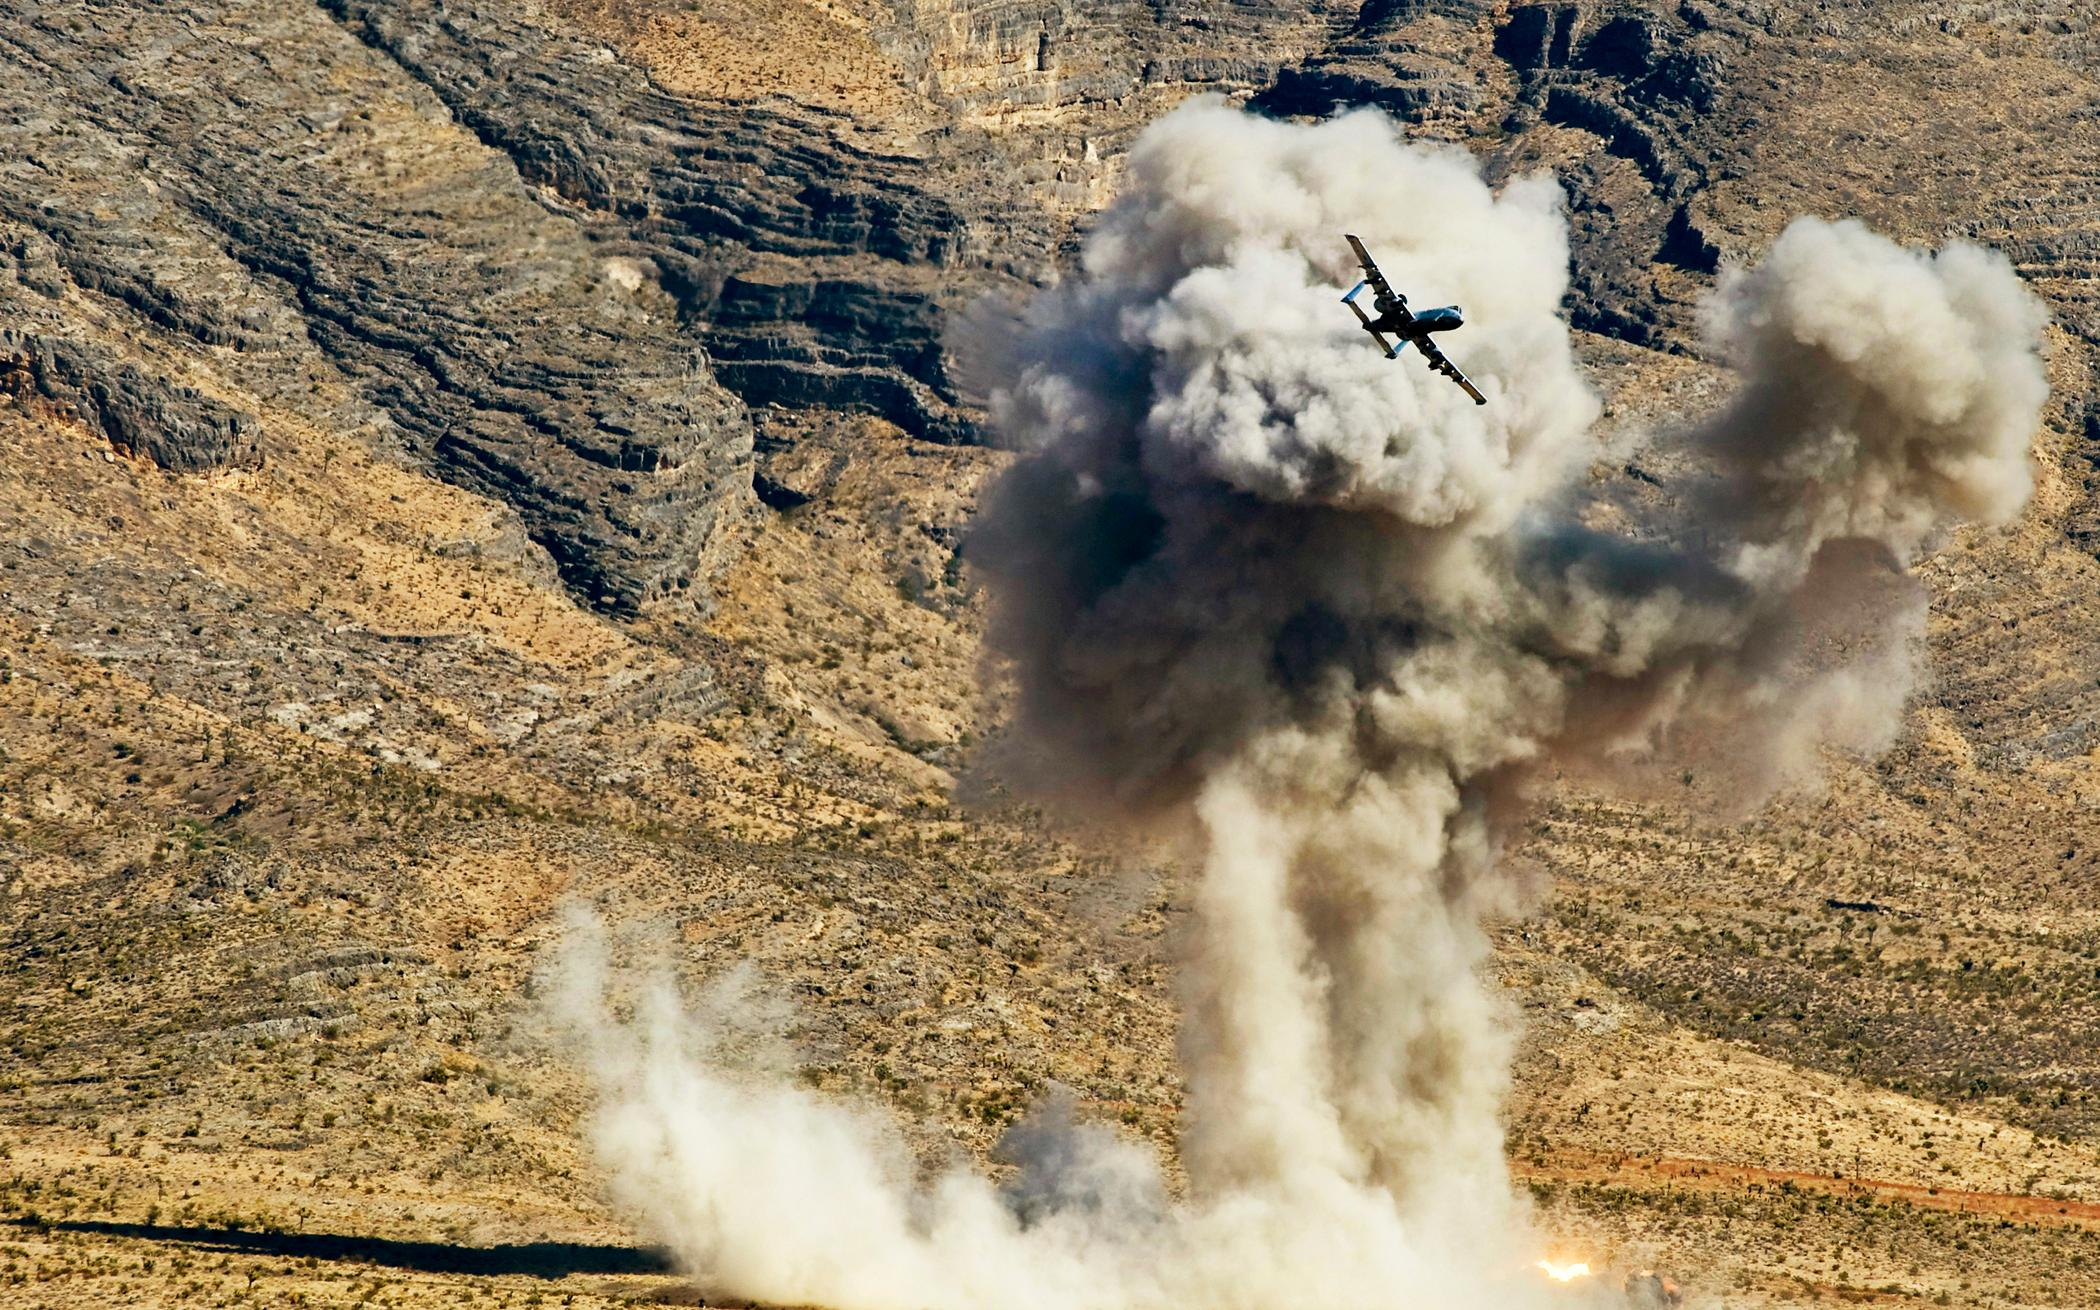 A-10 fires an AGM-65 Maverick missile